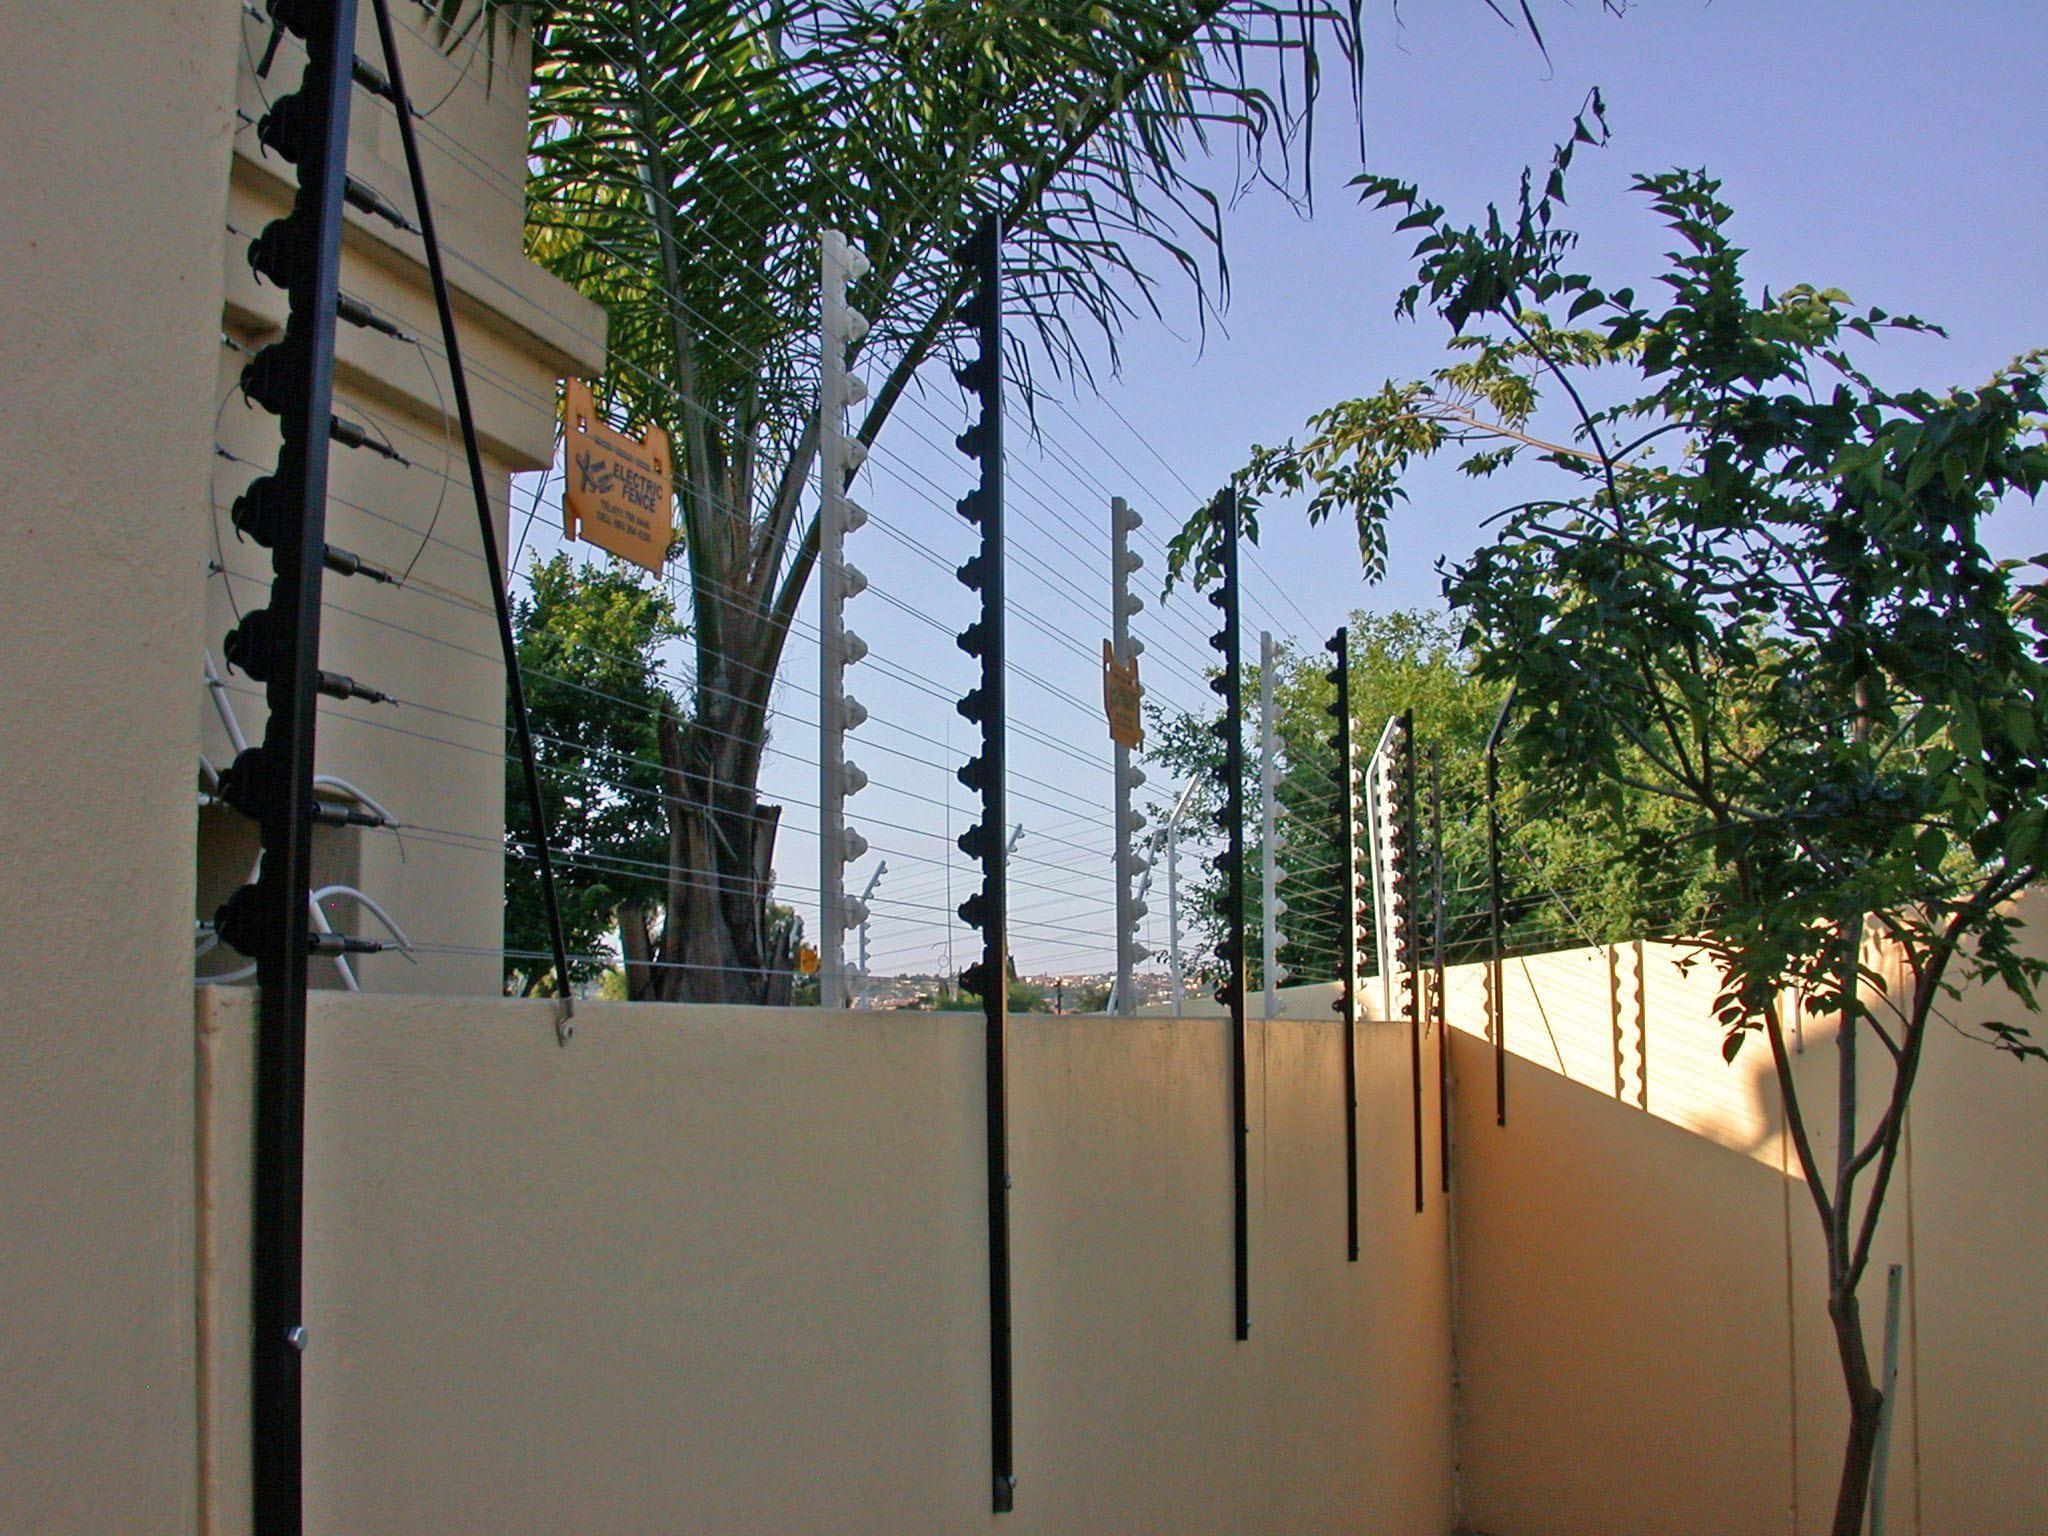 Electric Fence kenya, electric fence nairobi